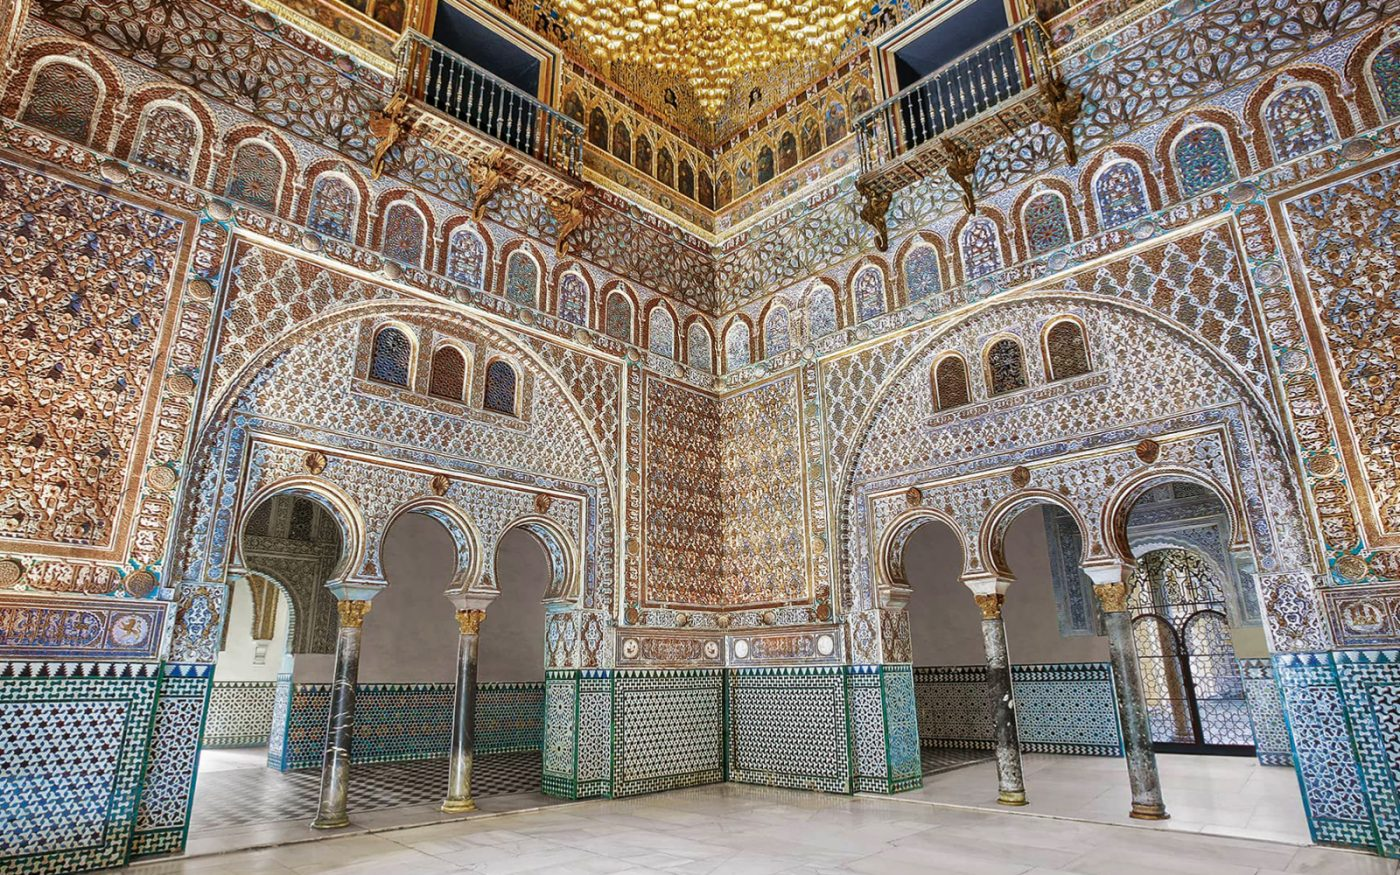 The Real Alcazar of Seville in Seville